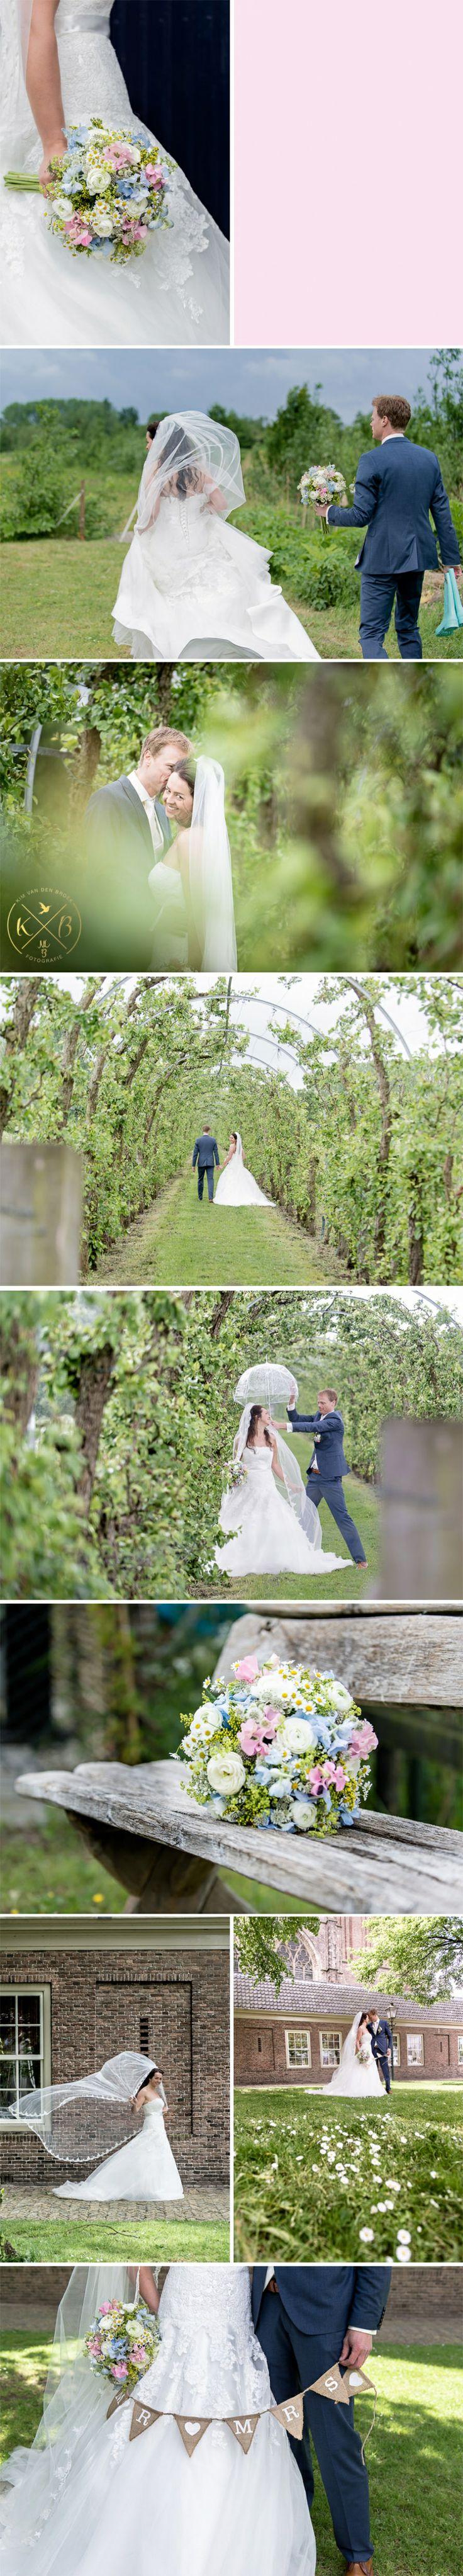 Mark & Lydia, Khotinsky, Villa Augustus & Bellevue at Dordrecht The Netherlands. Wedding photography by www.kimvandenbroek.nl